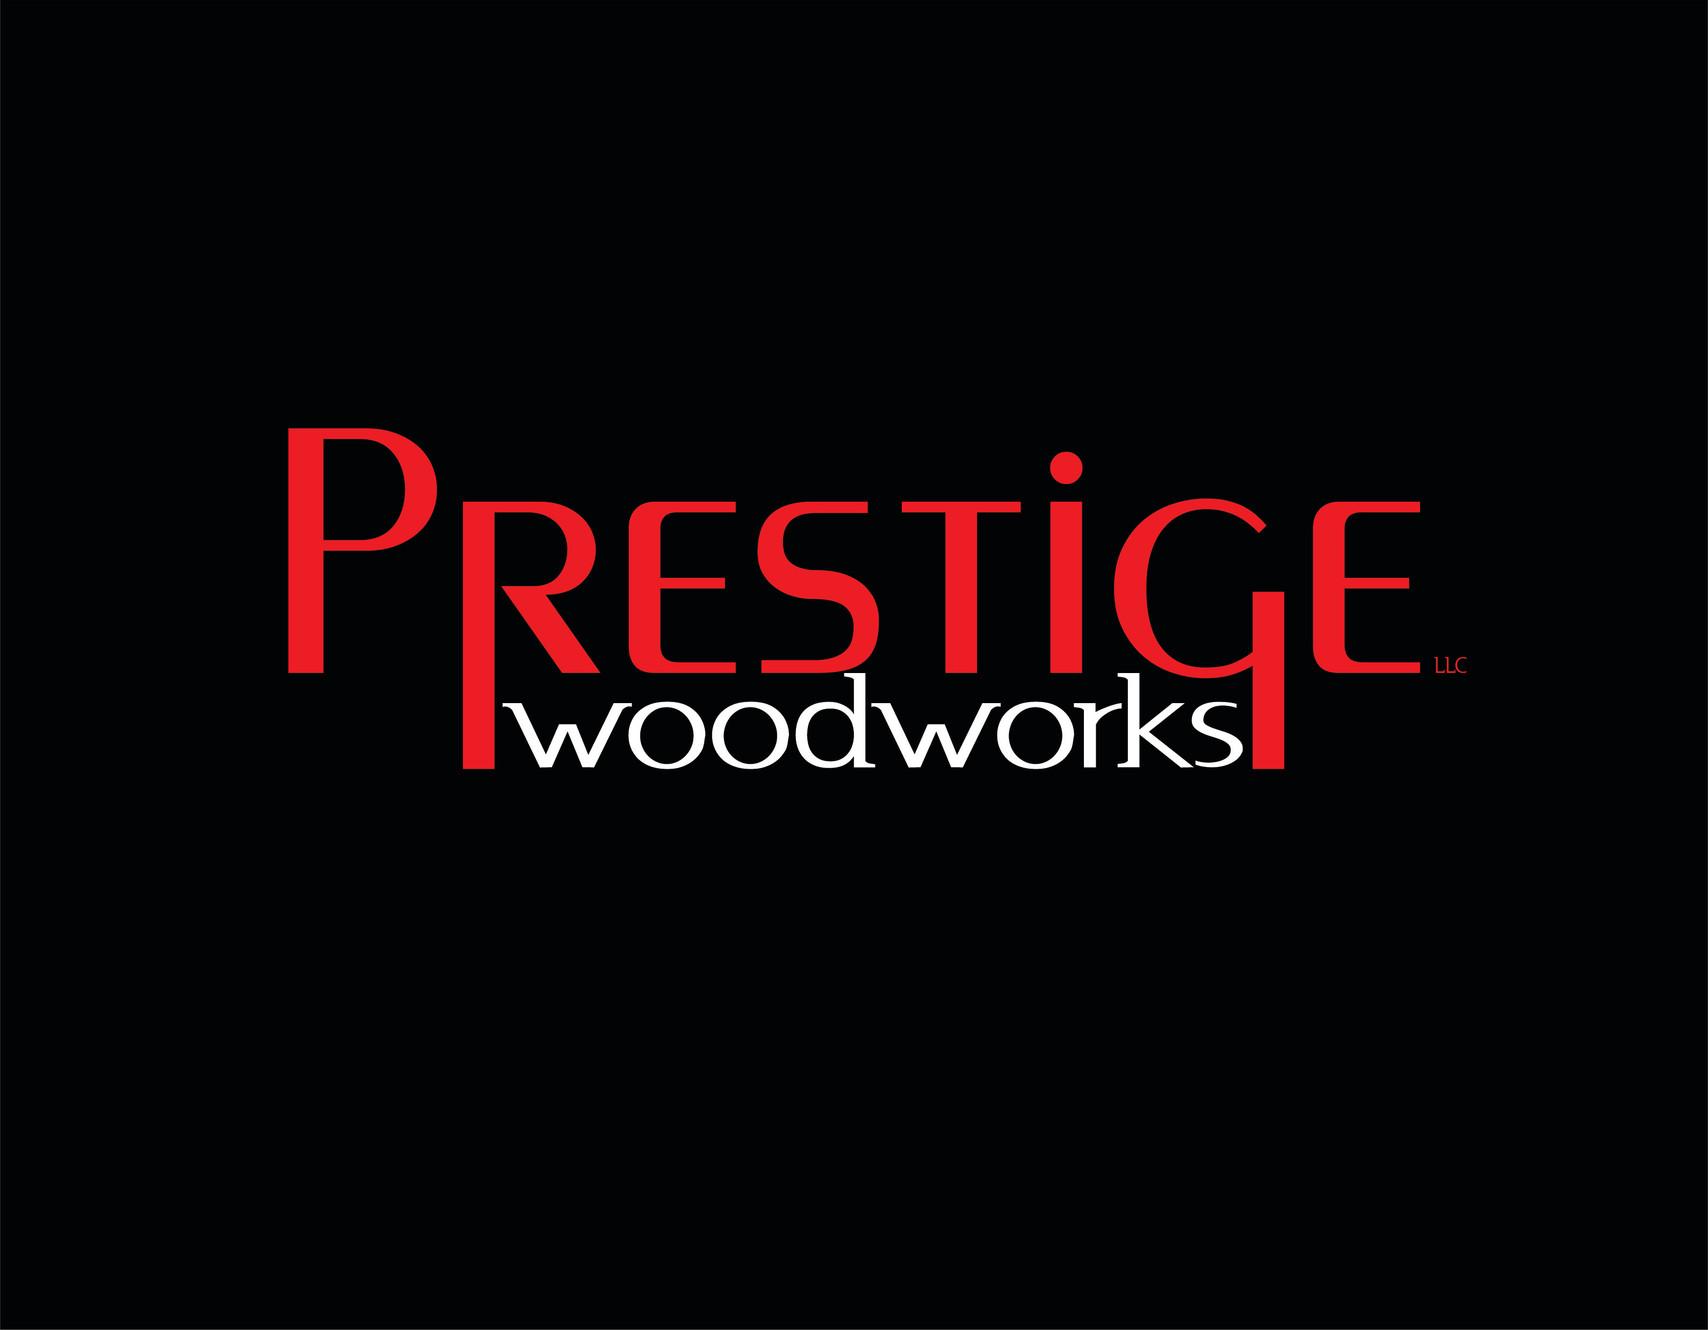 Prestige Woodworks logo